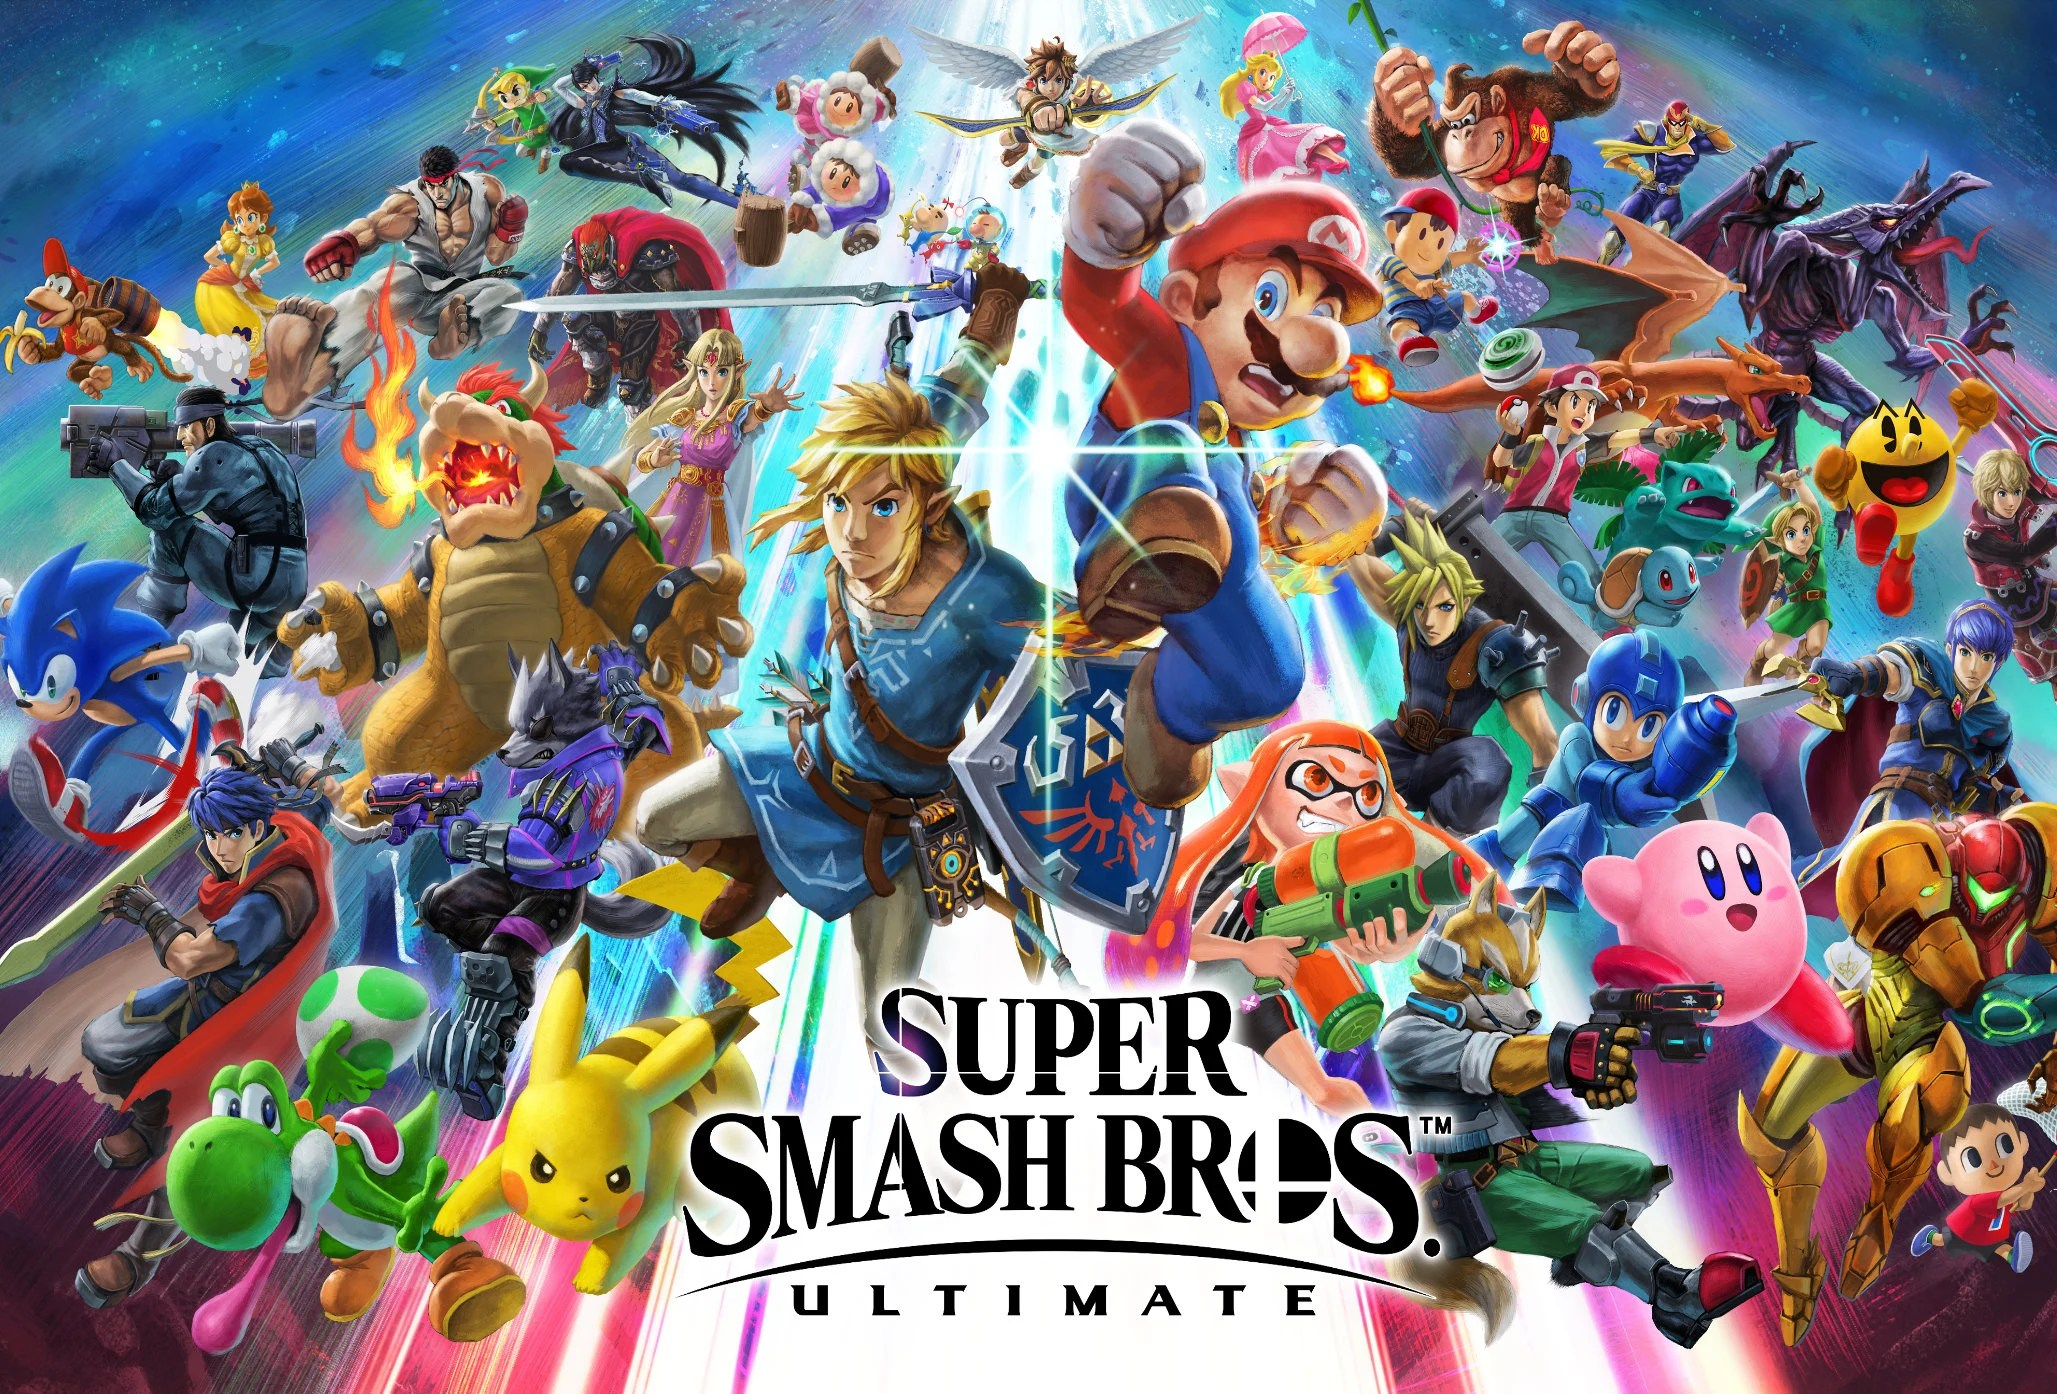 Super Smash Bros Ultimate Poster 13x19 Etsy